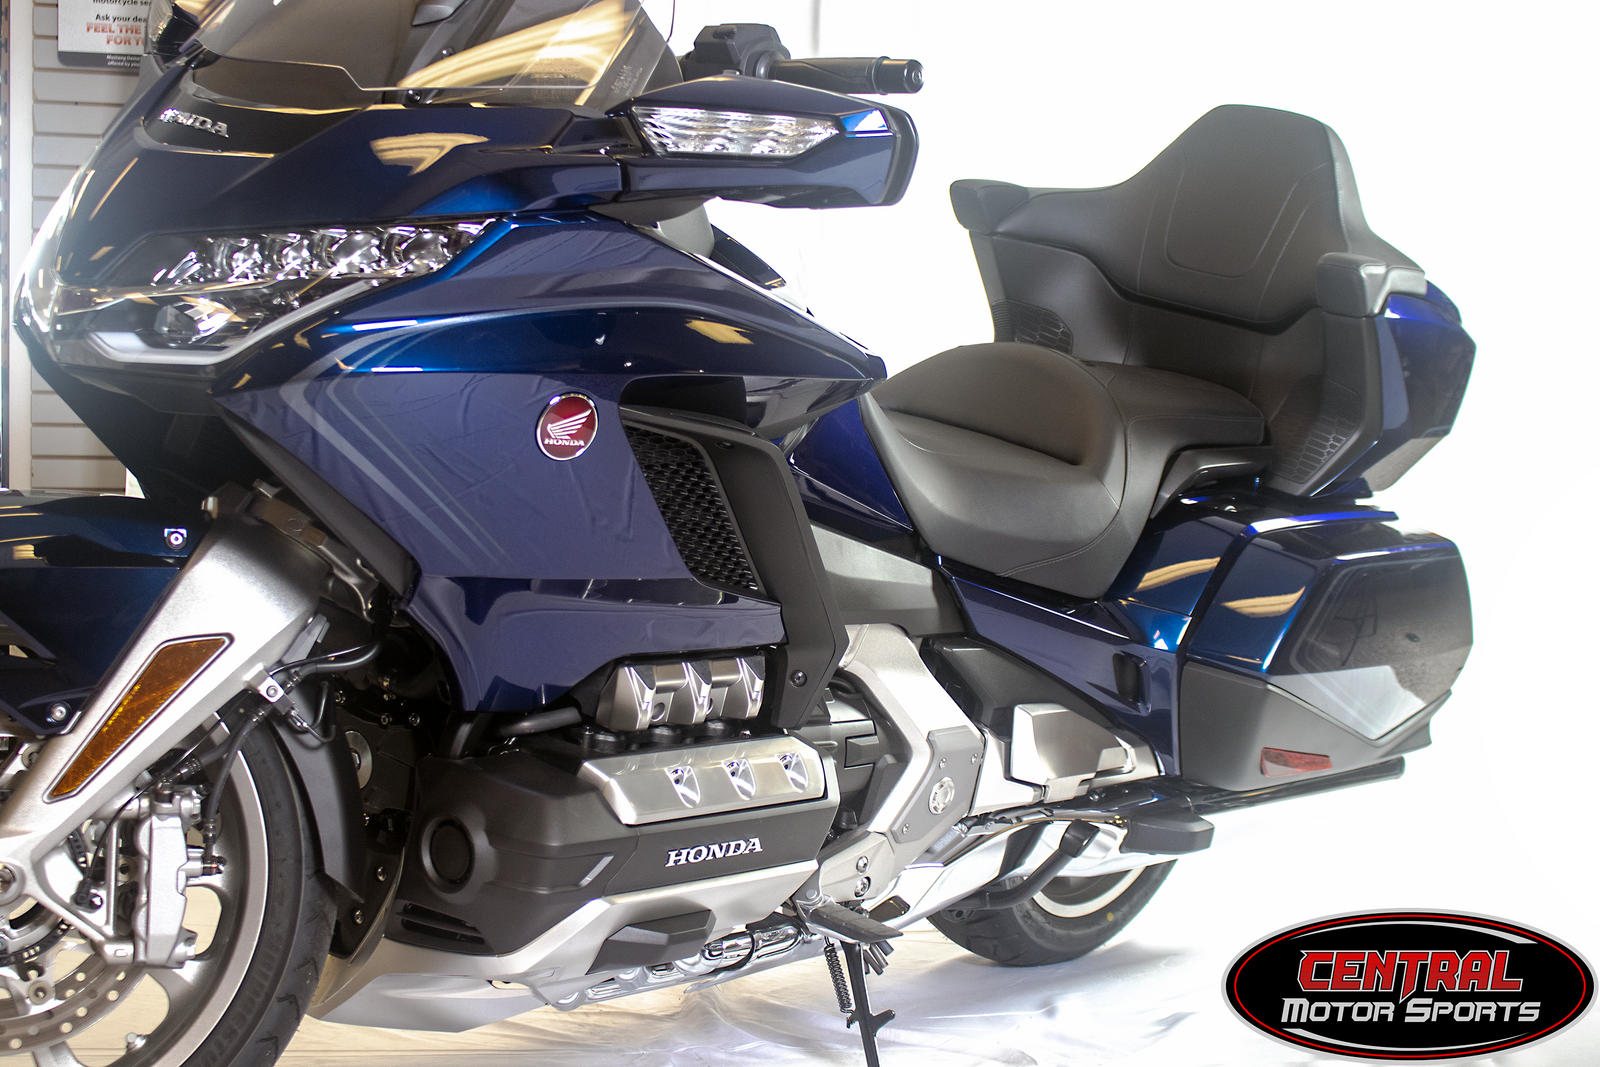 2018 Honda GL1800J - GOLD WING